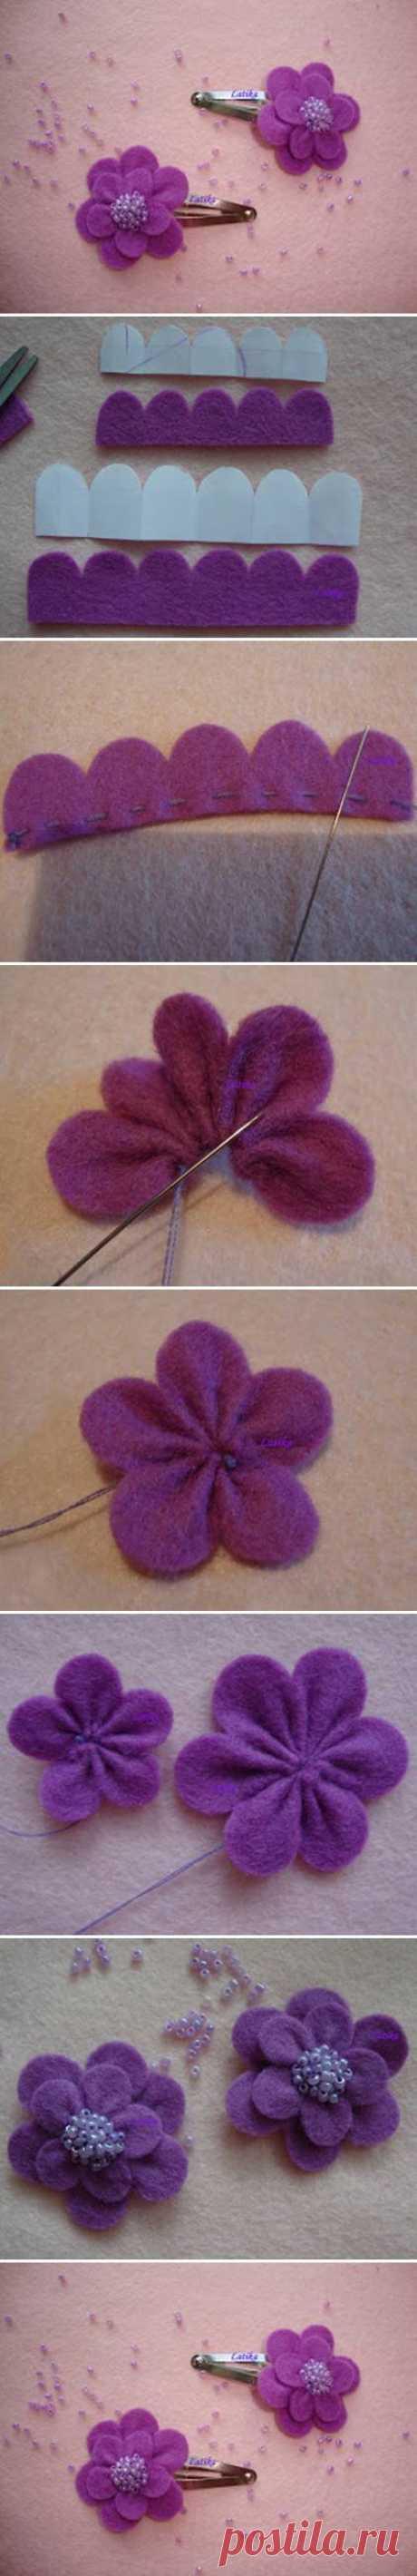 DIY Felt Morning Flower DIY Projects | UsefulDIY.com